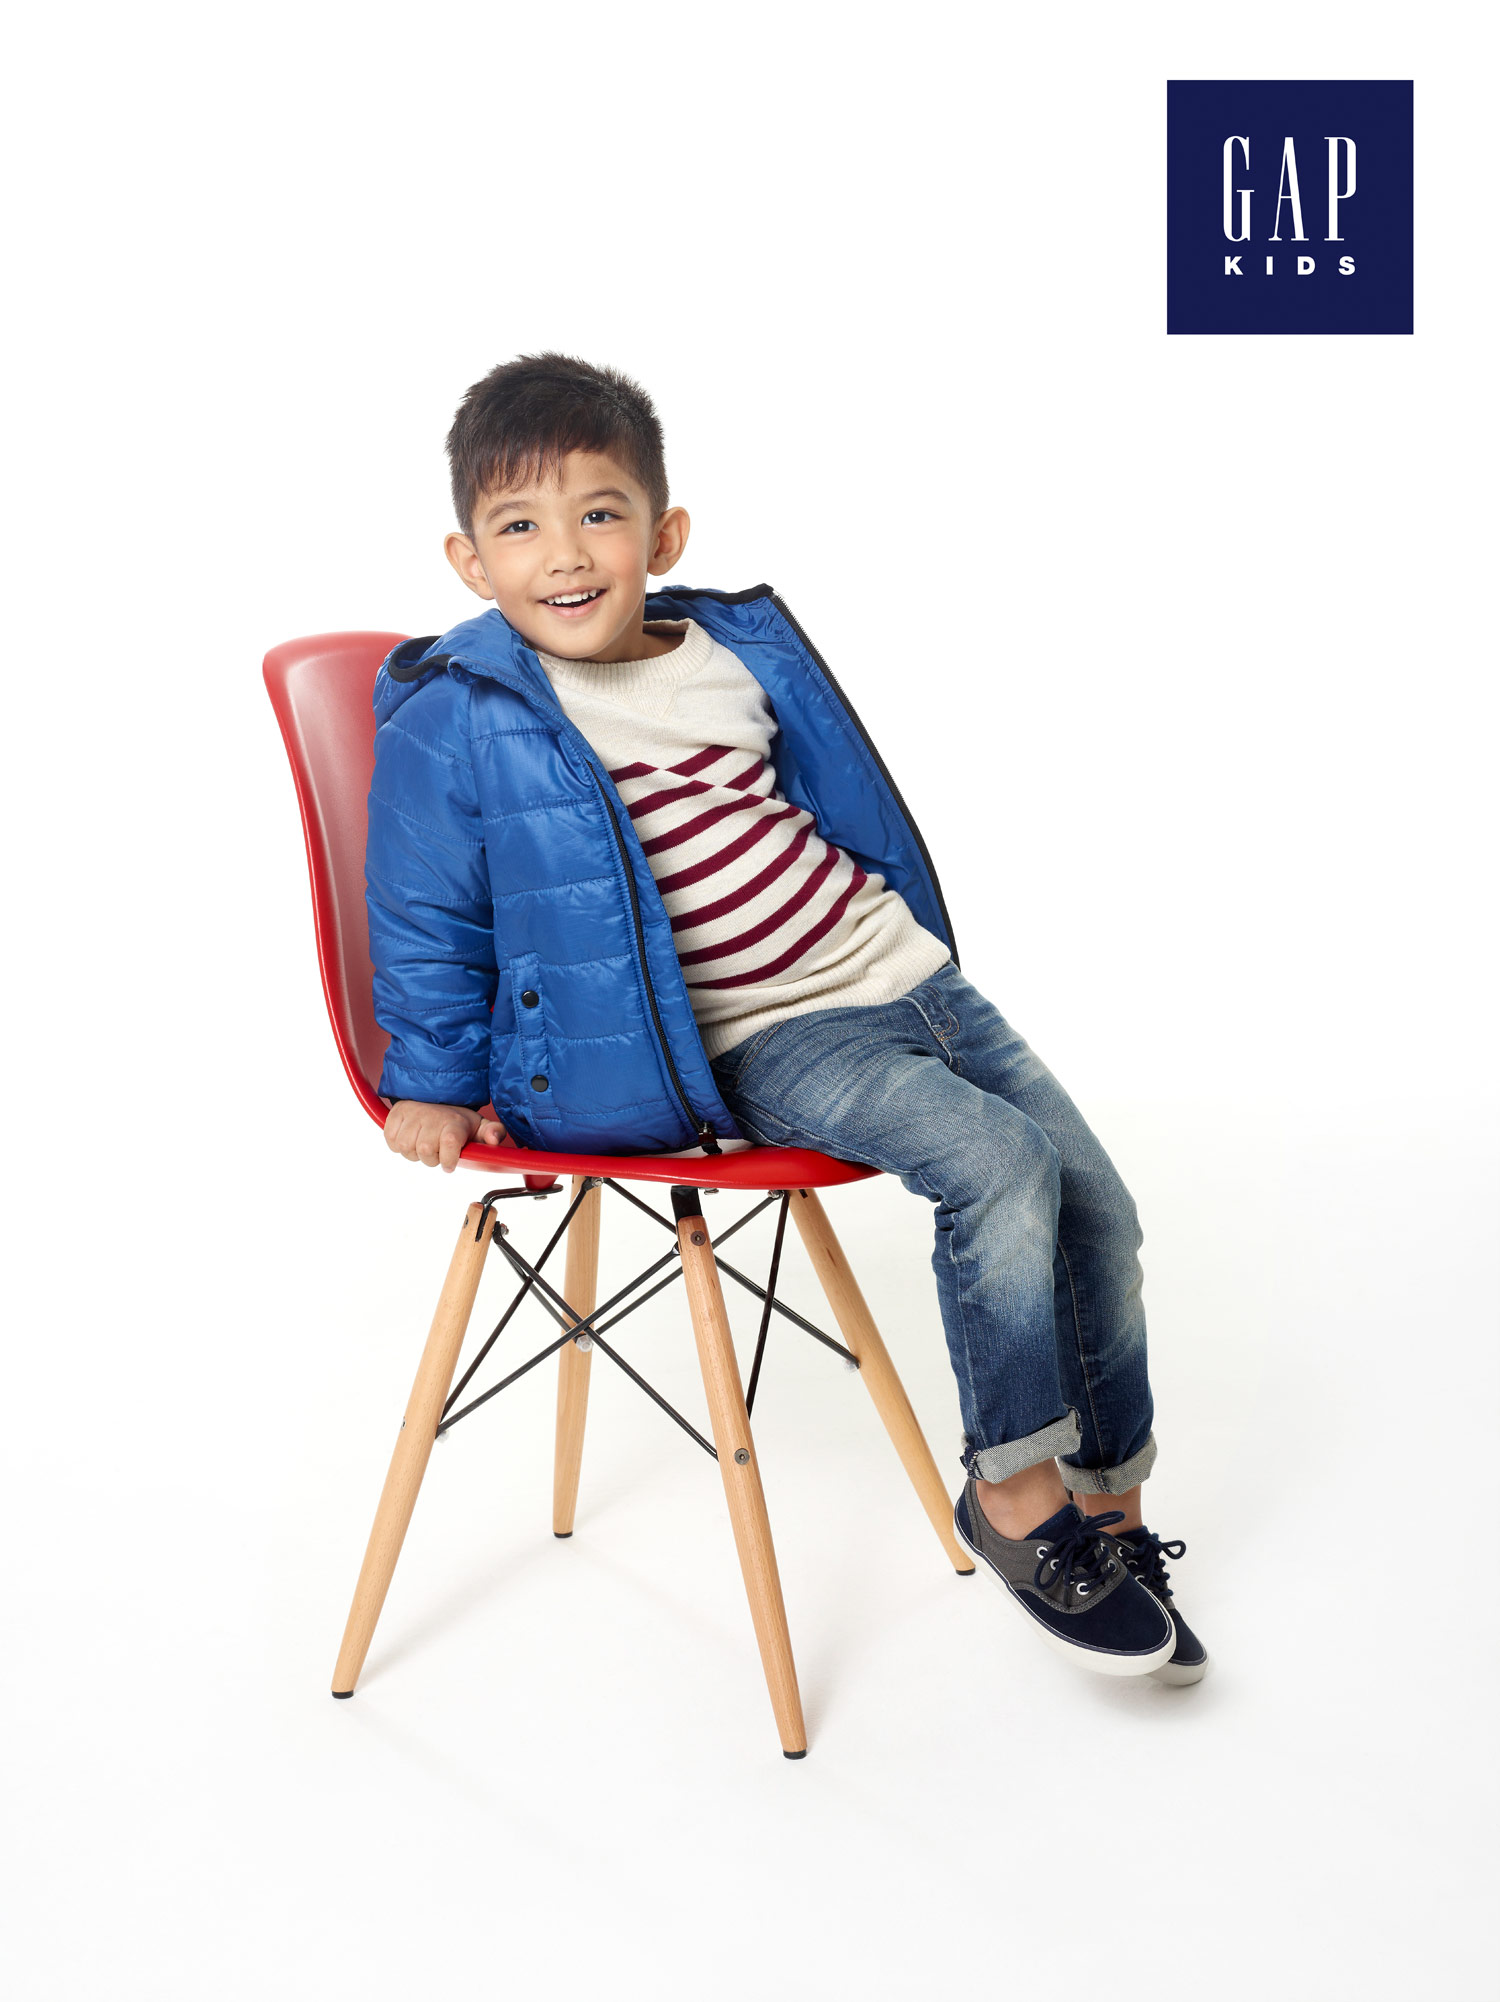 20141018--Gap-Kids-60378---Mark-2.jpg